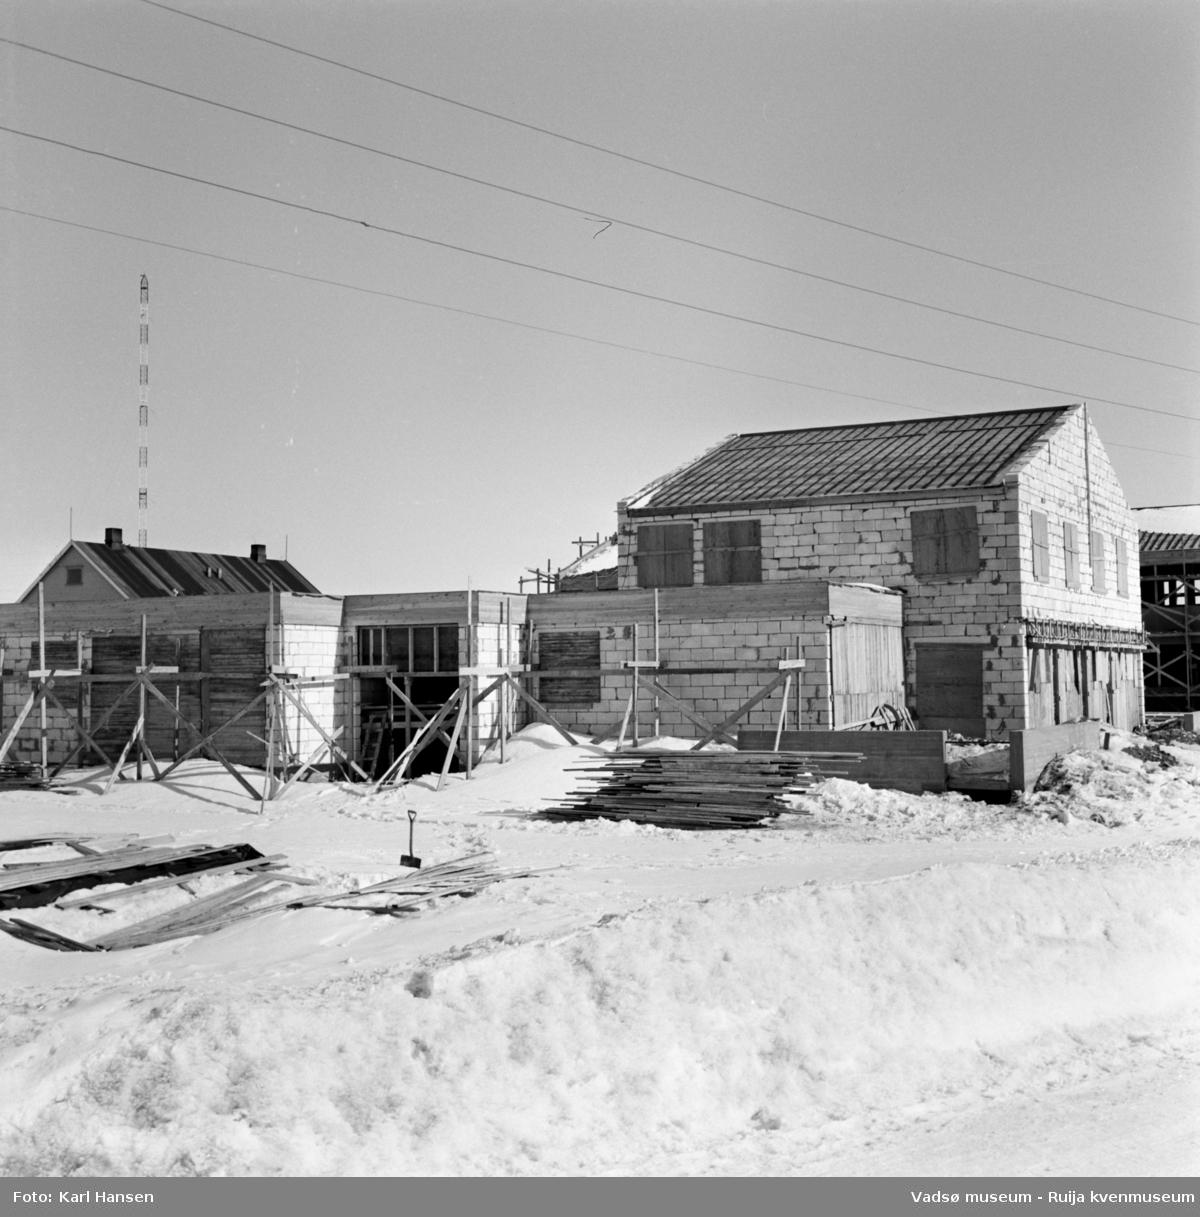 Vadsø 1962. Fylkesmannens bolig under oppføring i krysset Damsveien/G.Gulliksensgate.